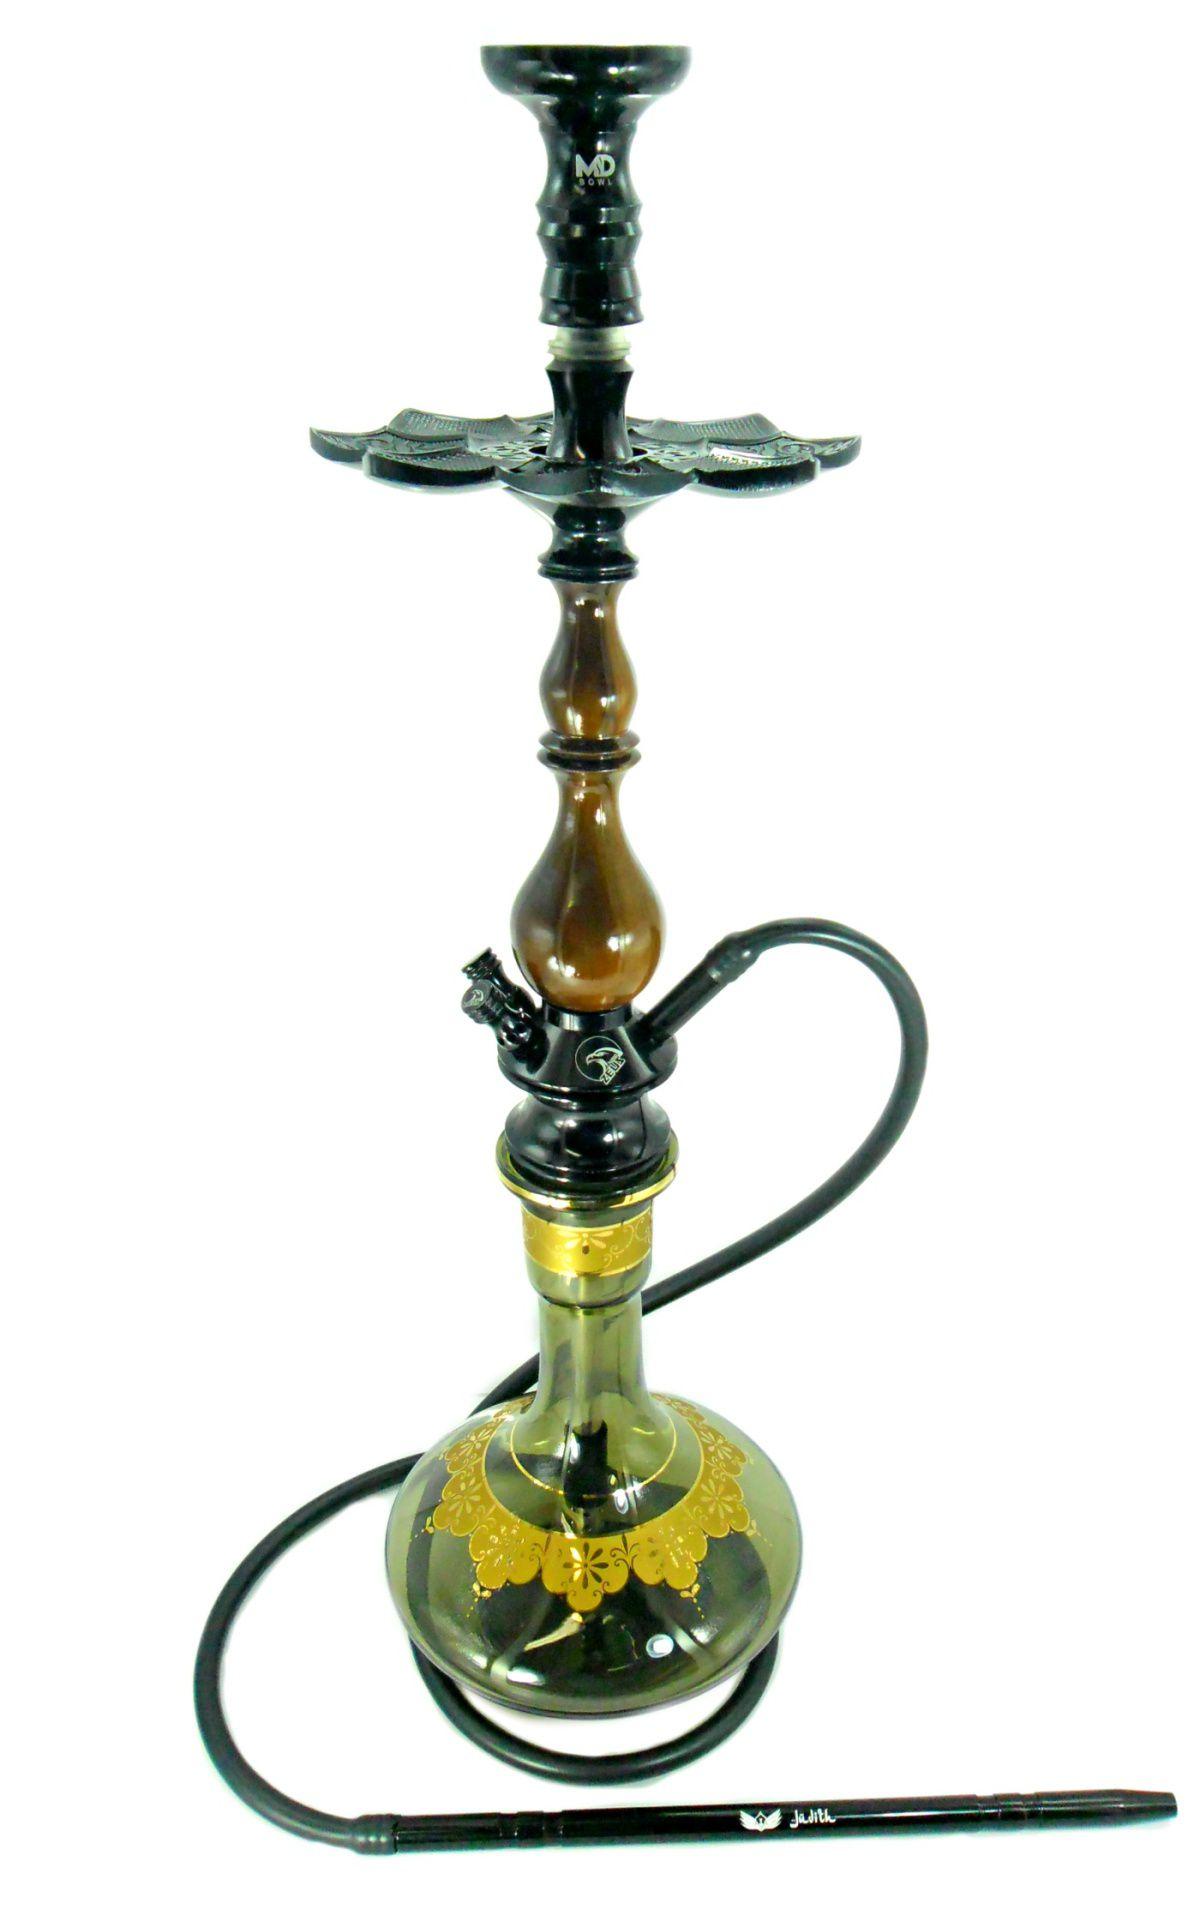 Narguile Zeus New preto 76cm, vaso Aladin, mangueira silic., piteira e rosh alumínio, prato ElNefes